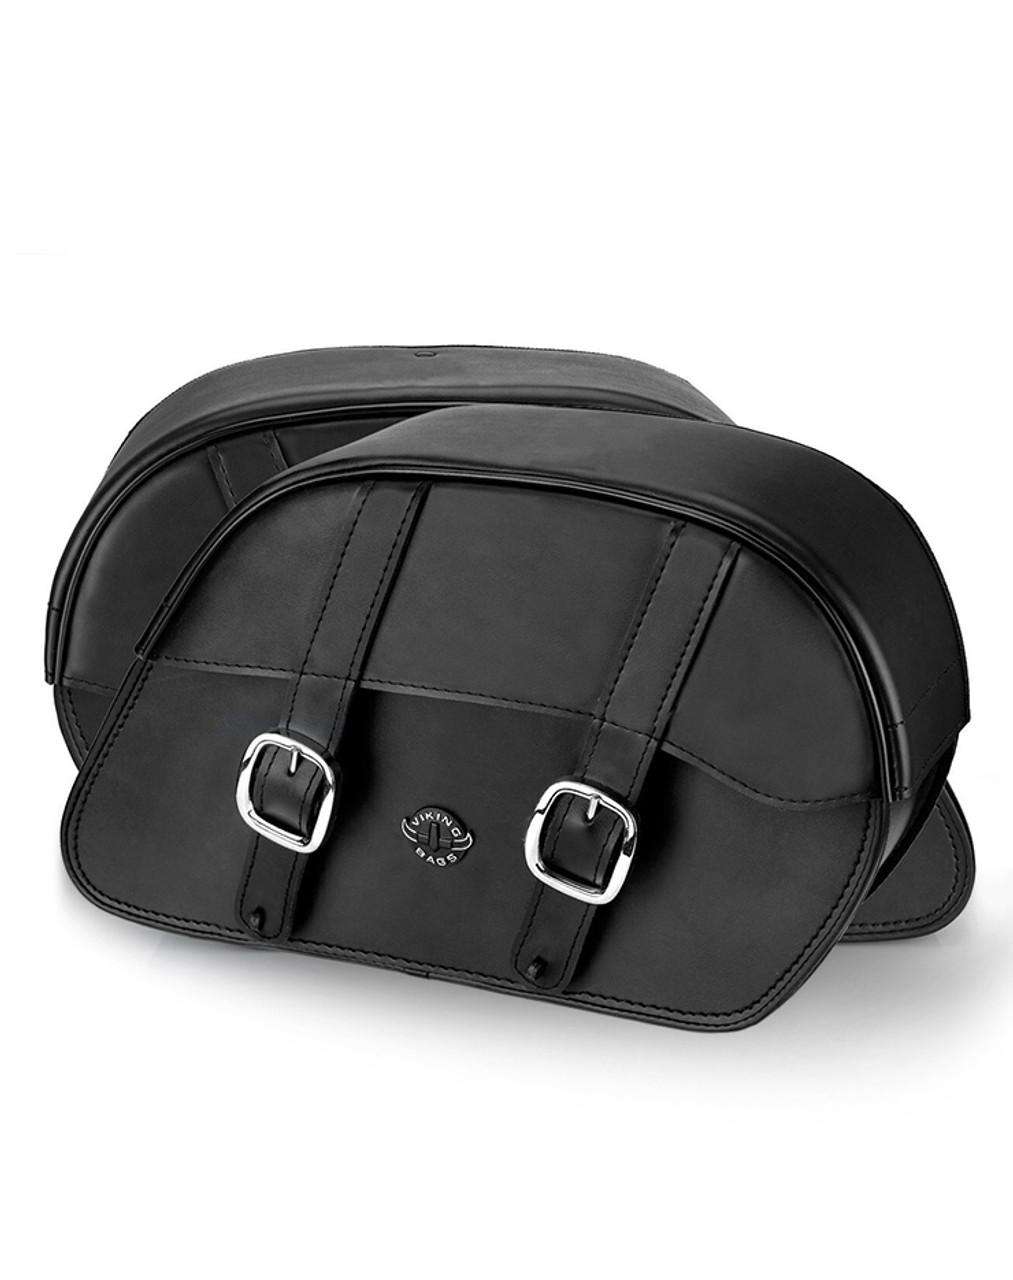 Honda VTX 1800 R (Retro) Medium Plain Slanted Motorcycle Saddlebags Both Bags View